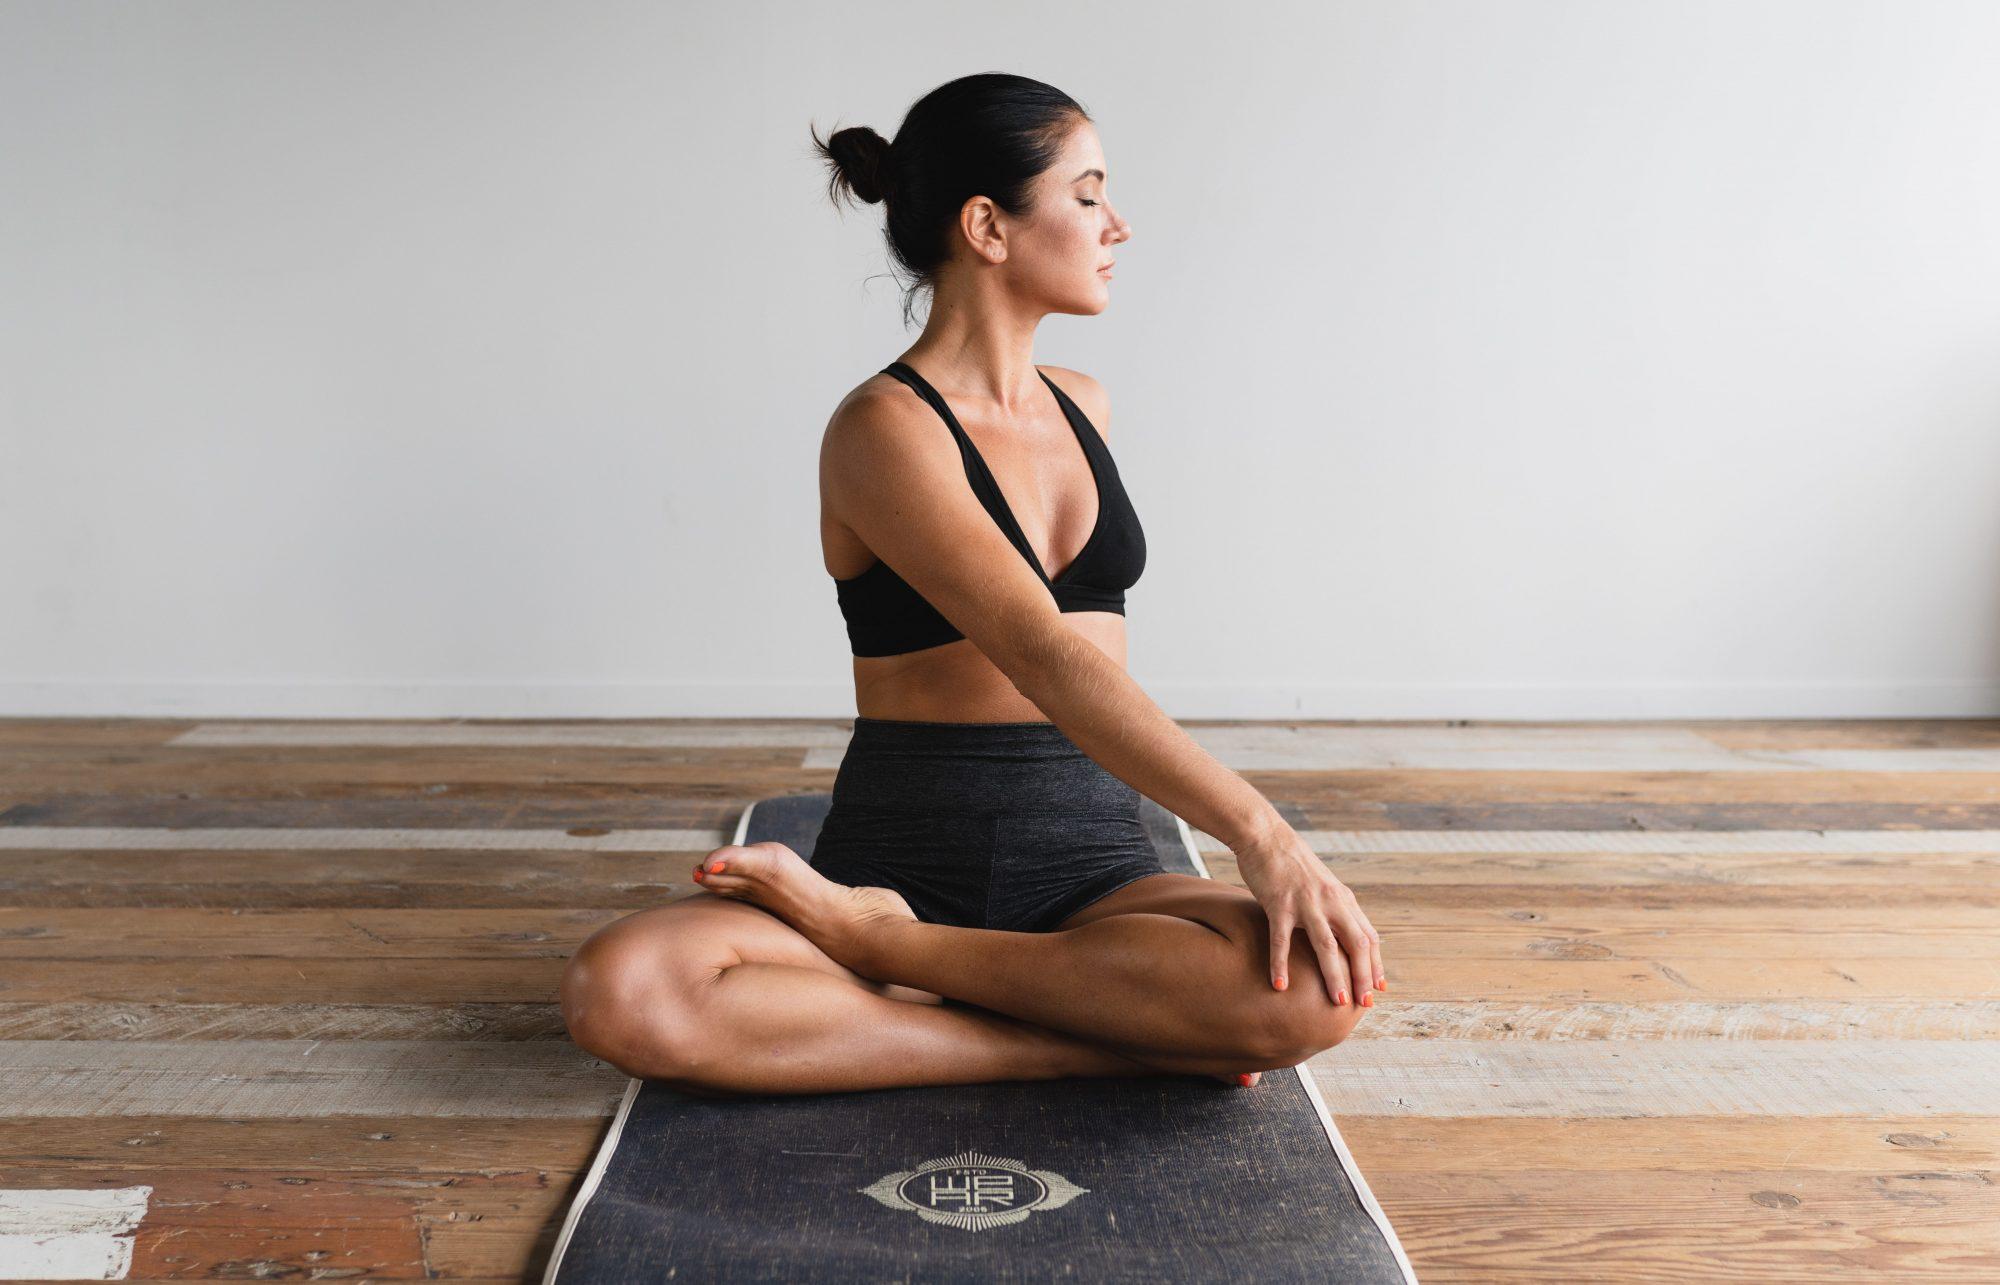 Yoga: Γυμνάζει ή απλώς ηρεμεί;